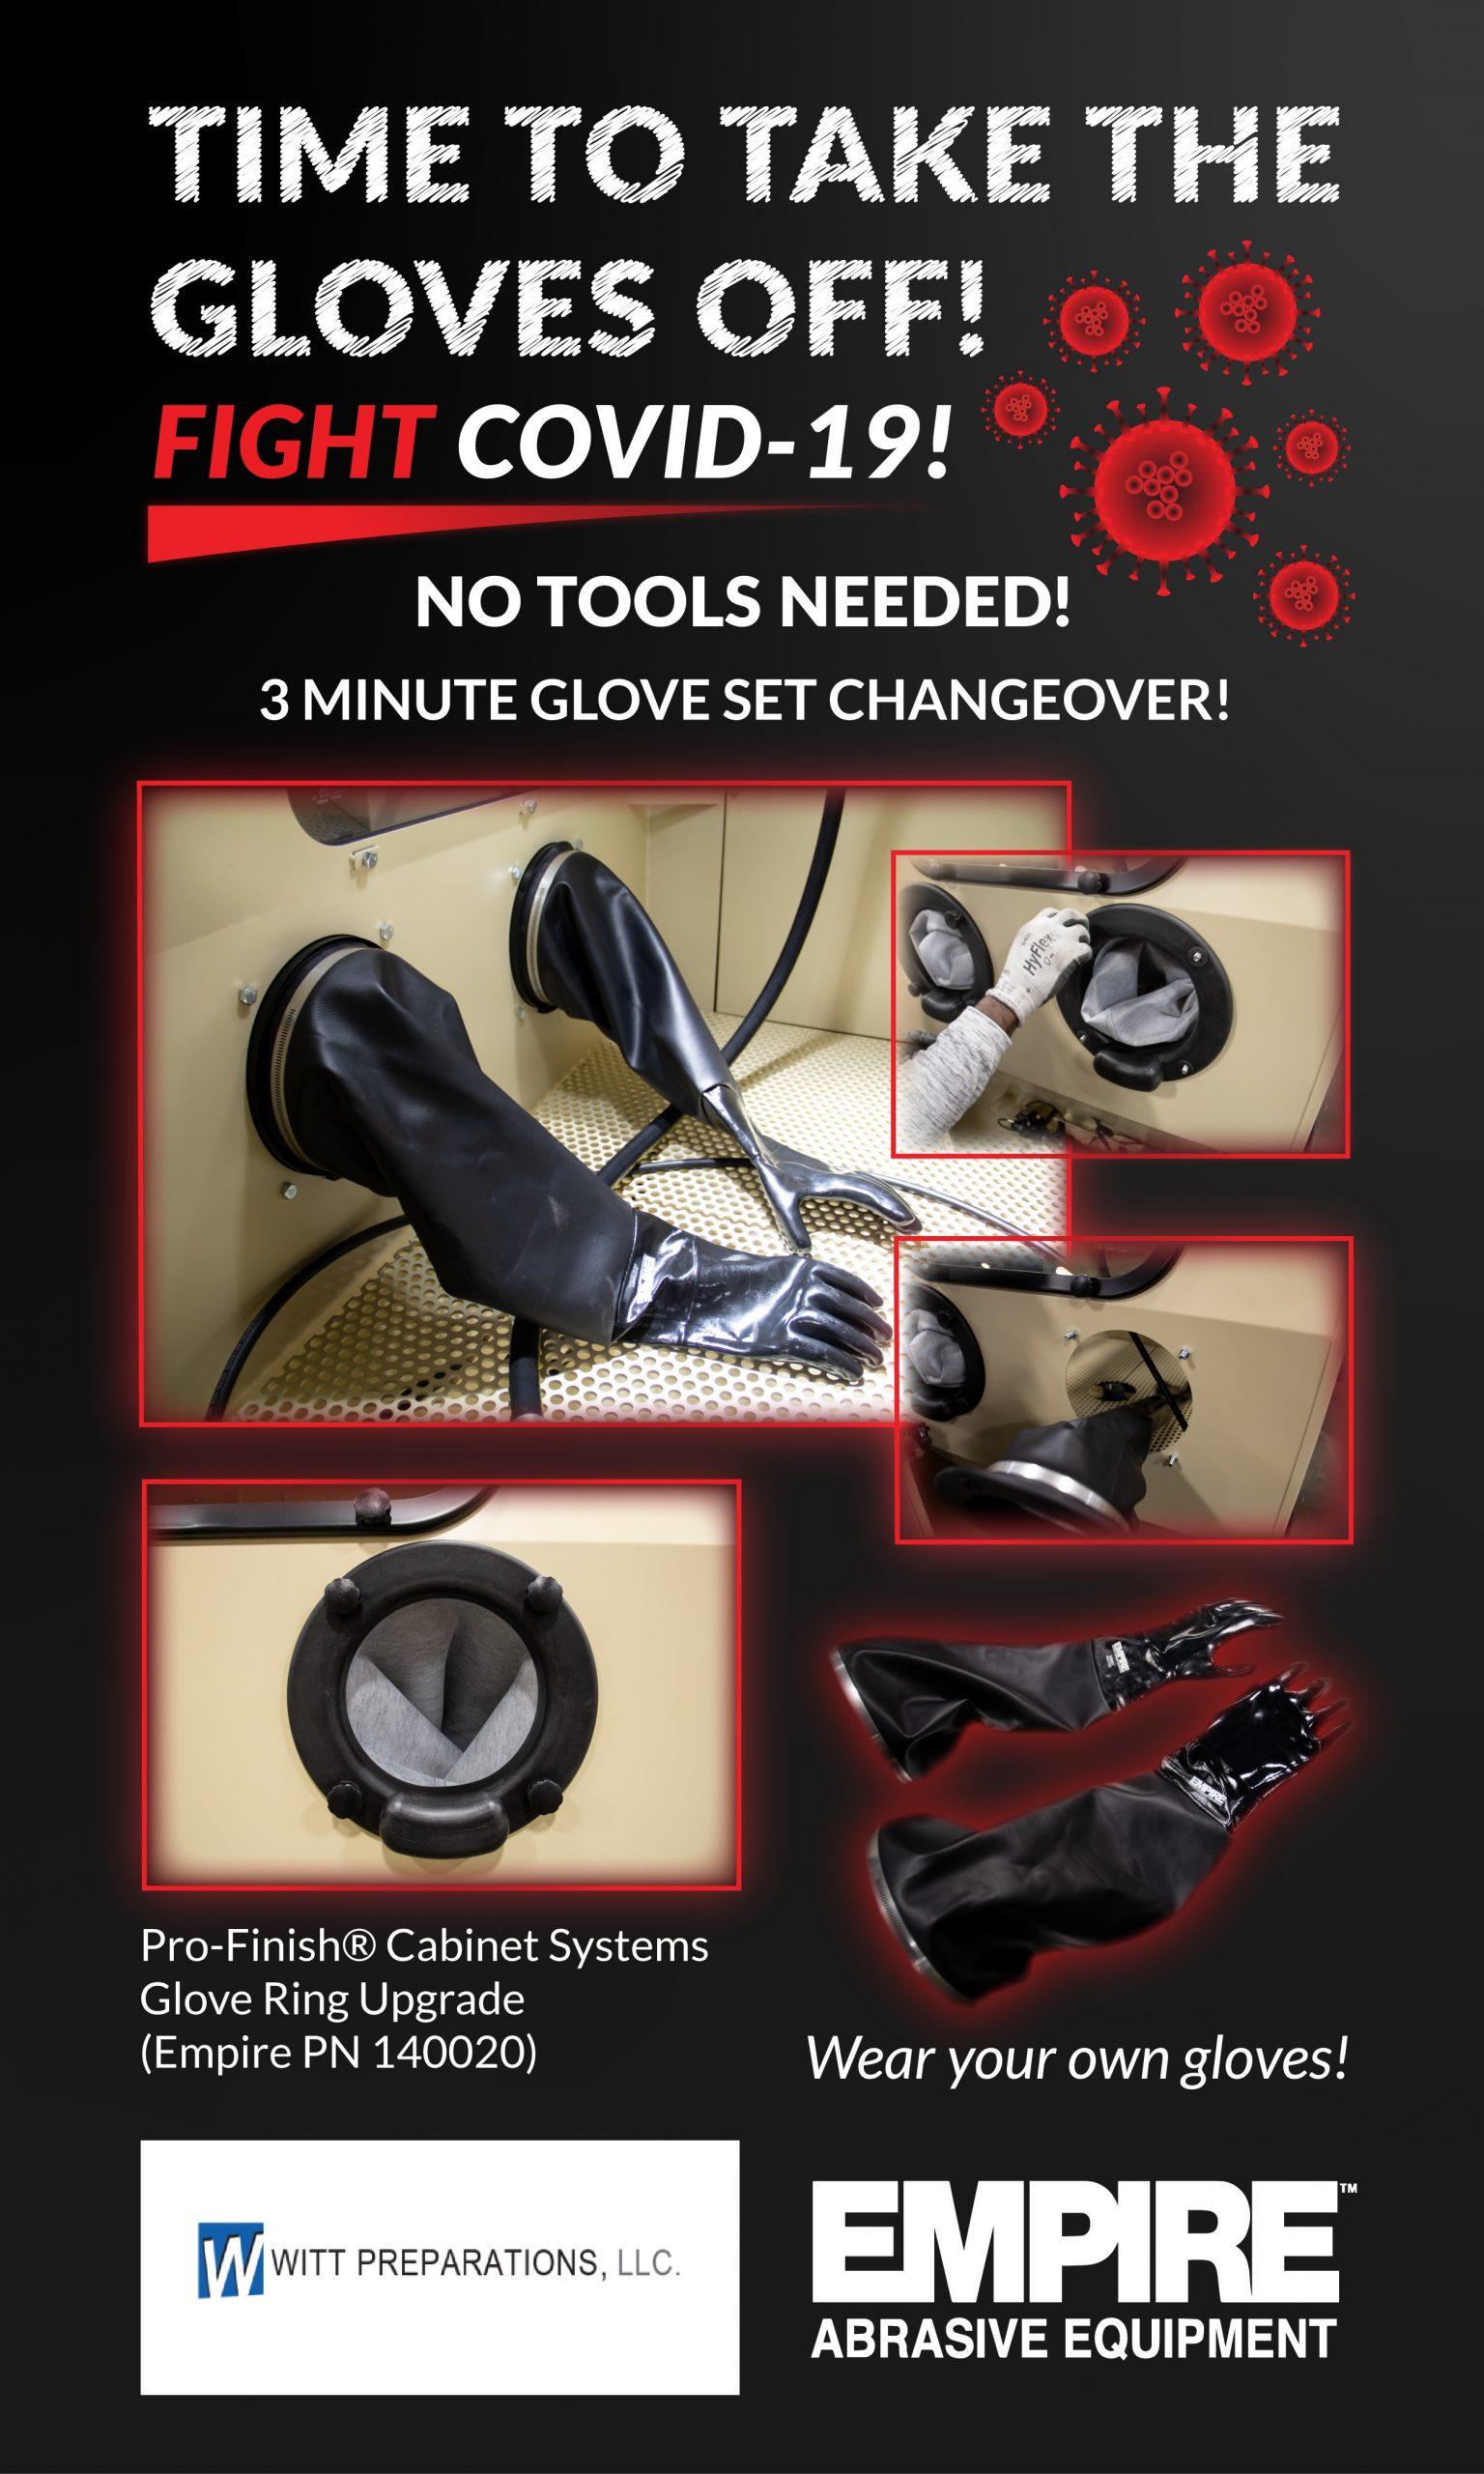 Empire Glove Conversion Kit Special!